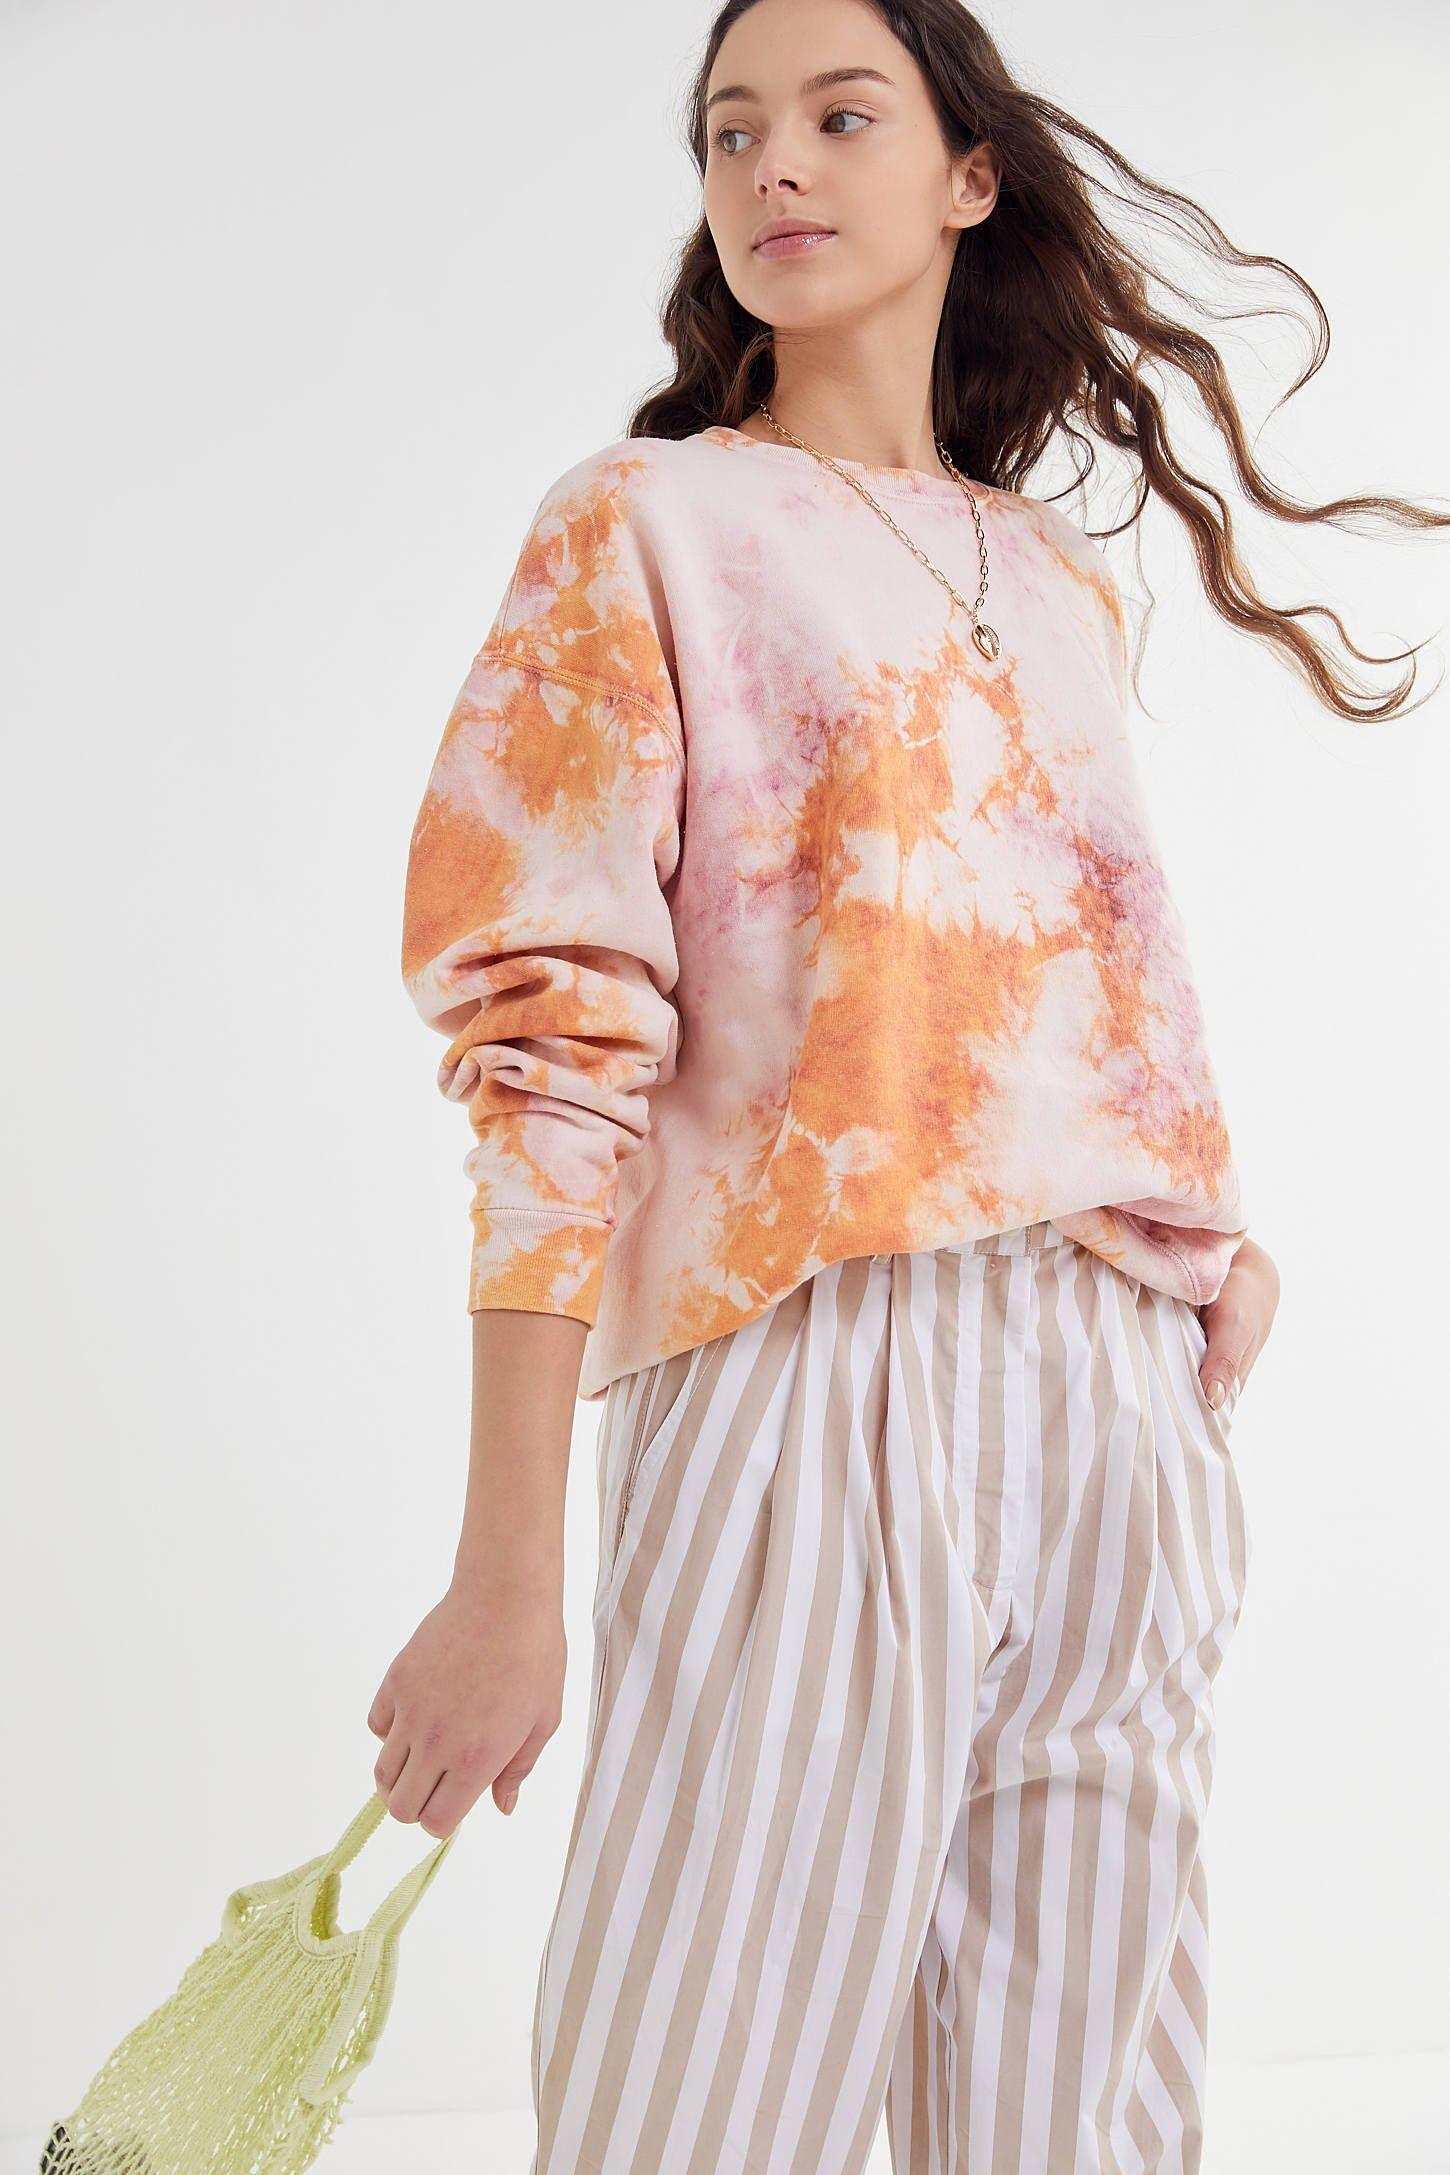 Urban Renewal Recycled Tie Dye Crew Neck Sweatshirt In 2021 Tie Dye Fashion Crewneck Sweatshirt Women Tie Dye Sweater [ 2175 x 1450 Pixel ]